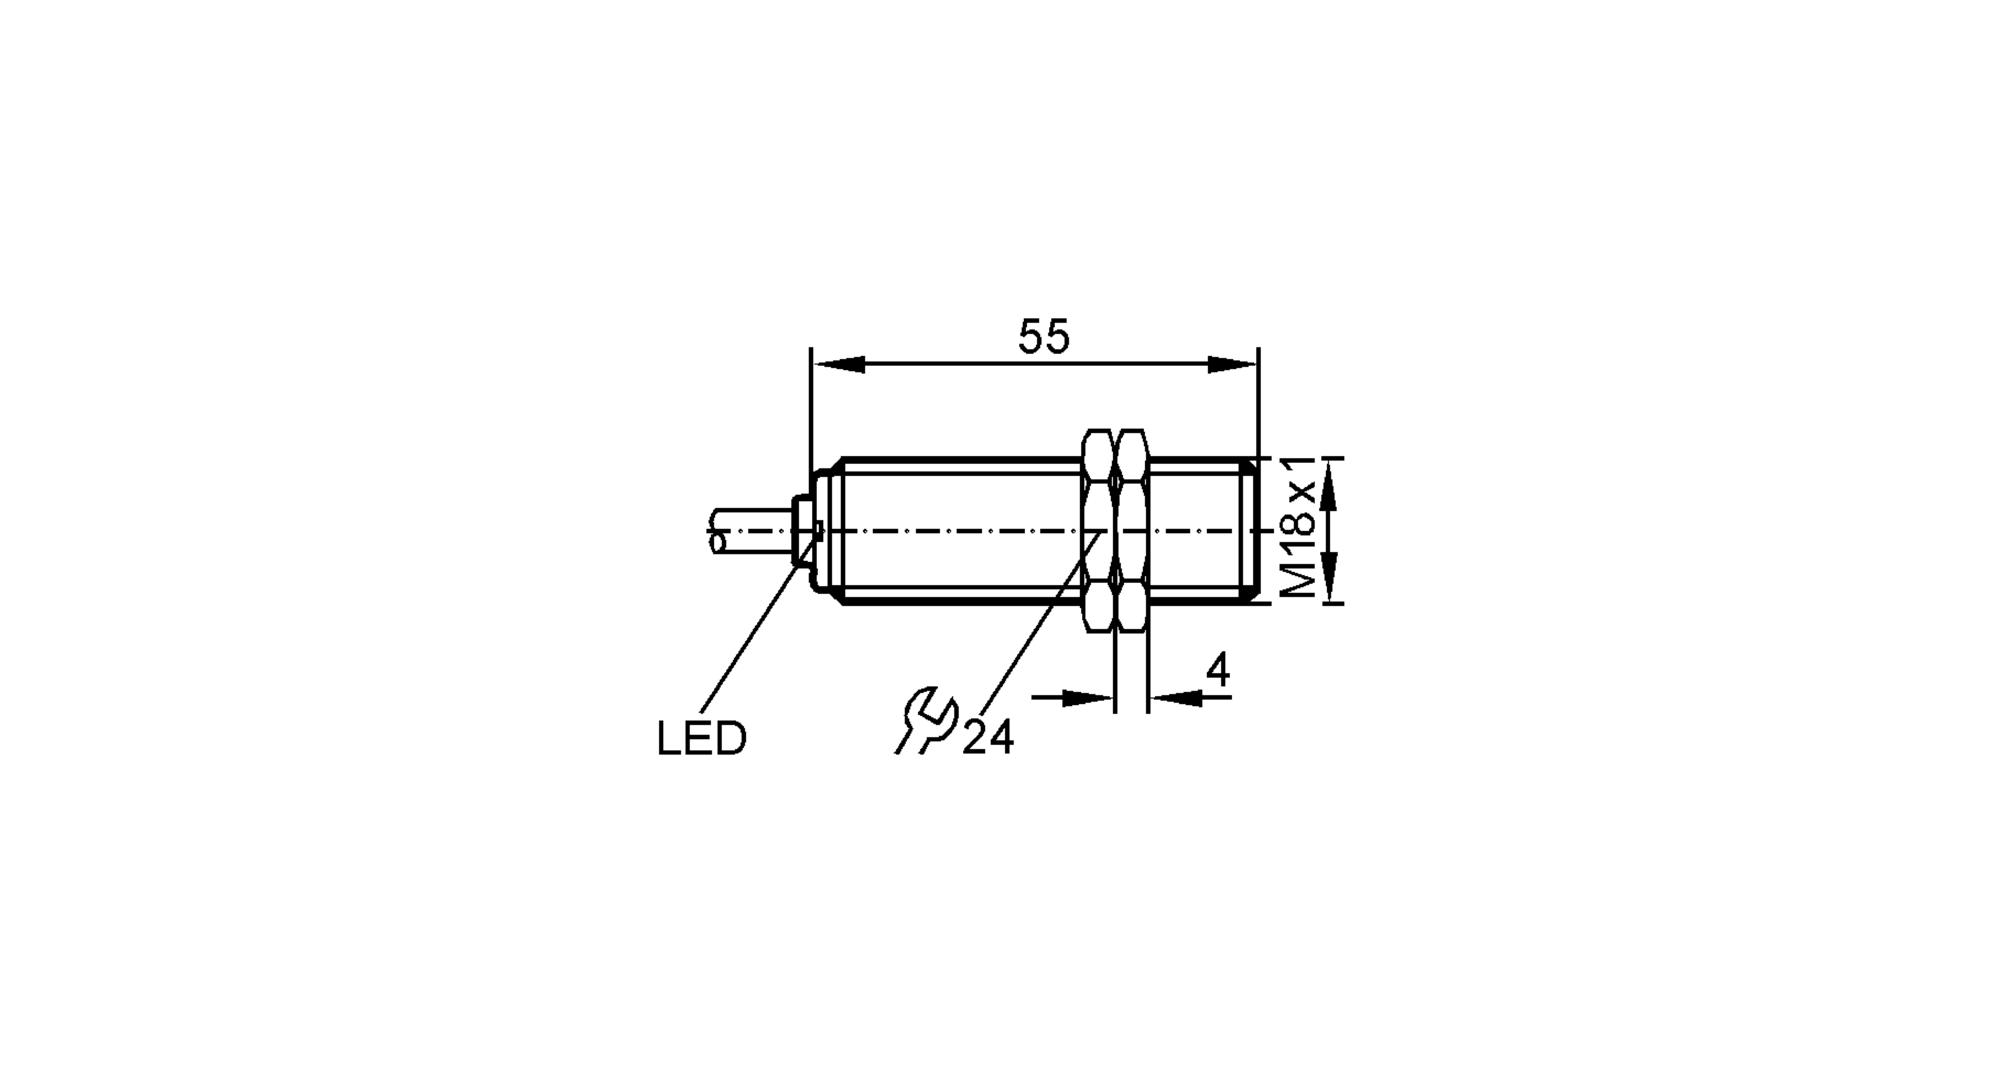 ig0378 - inductive sensor